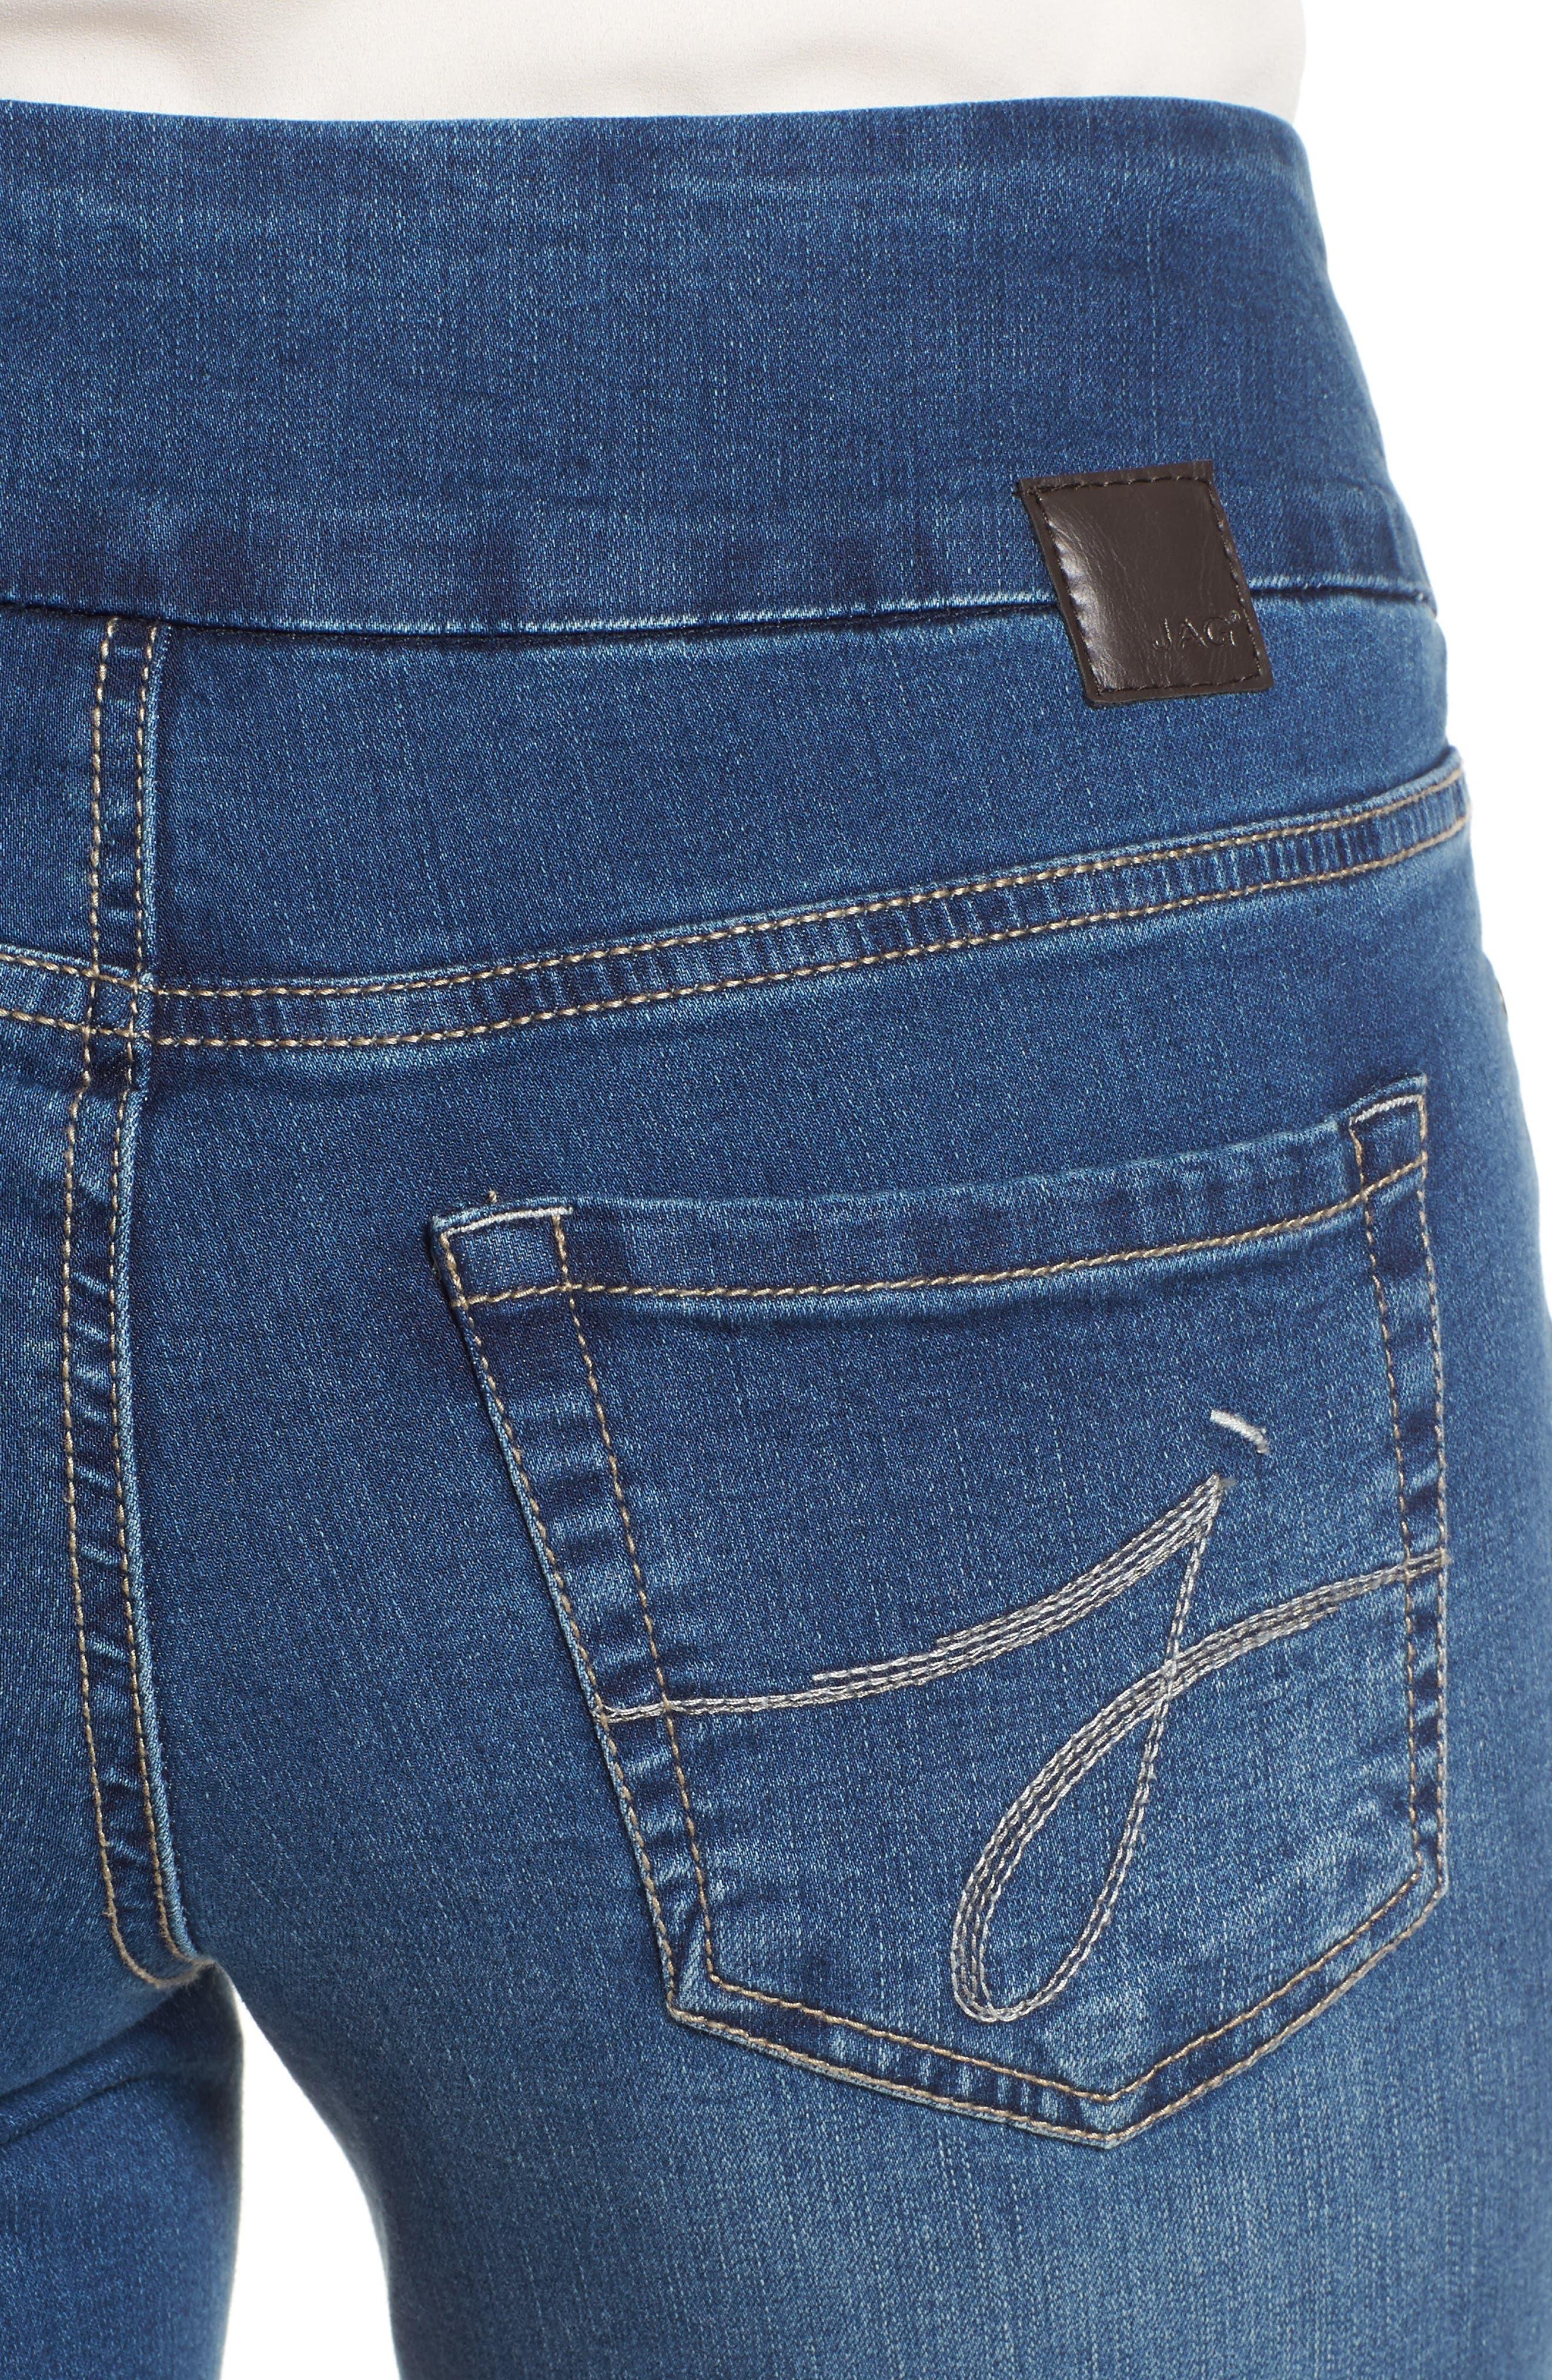 JAG JEANS, Peri Pull-On Straight Leg Jeans, Alternate thumbnail 4, color, MEDIUM INDIGO